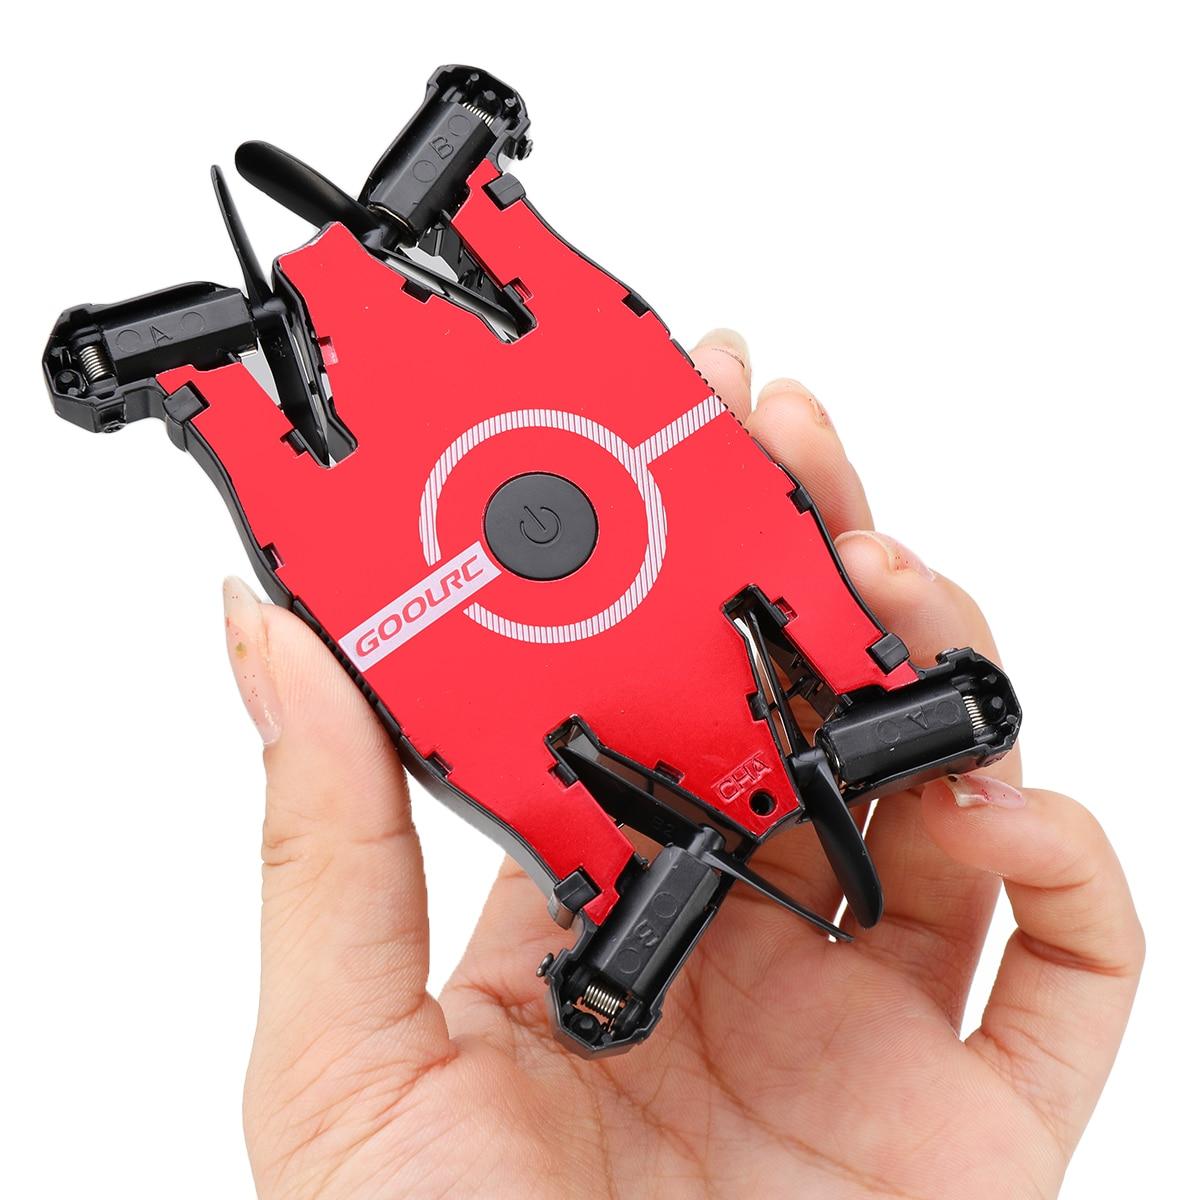 JJRC T49 Wifi FPV Mini Selfie Drone HD Camera Auto Foldable Arm RC Quadcopter Helicopter Christmas Gift Kid VS H37 E57